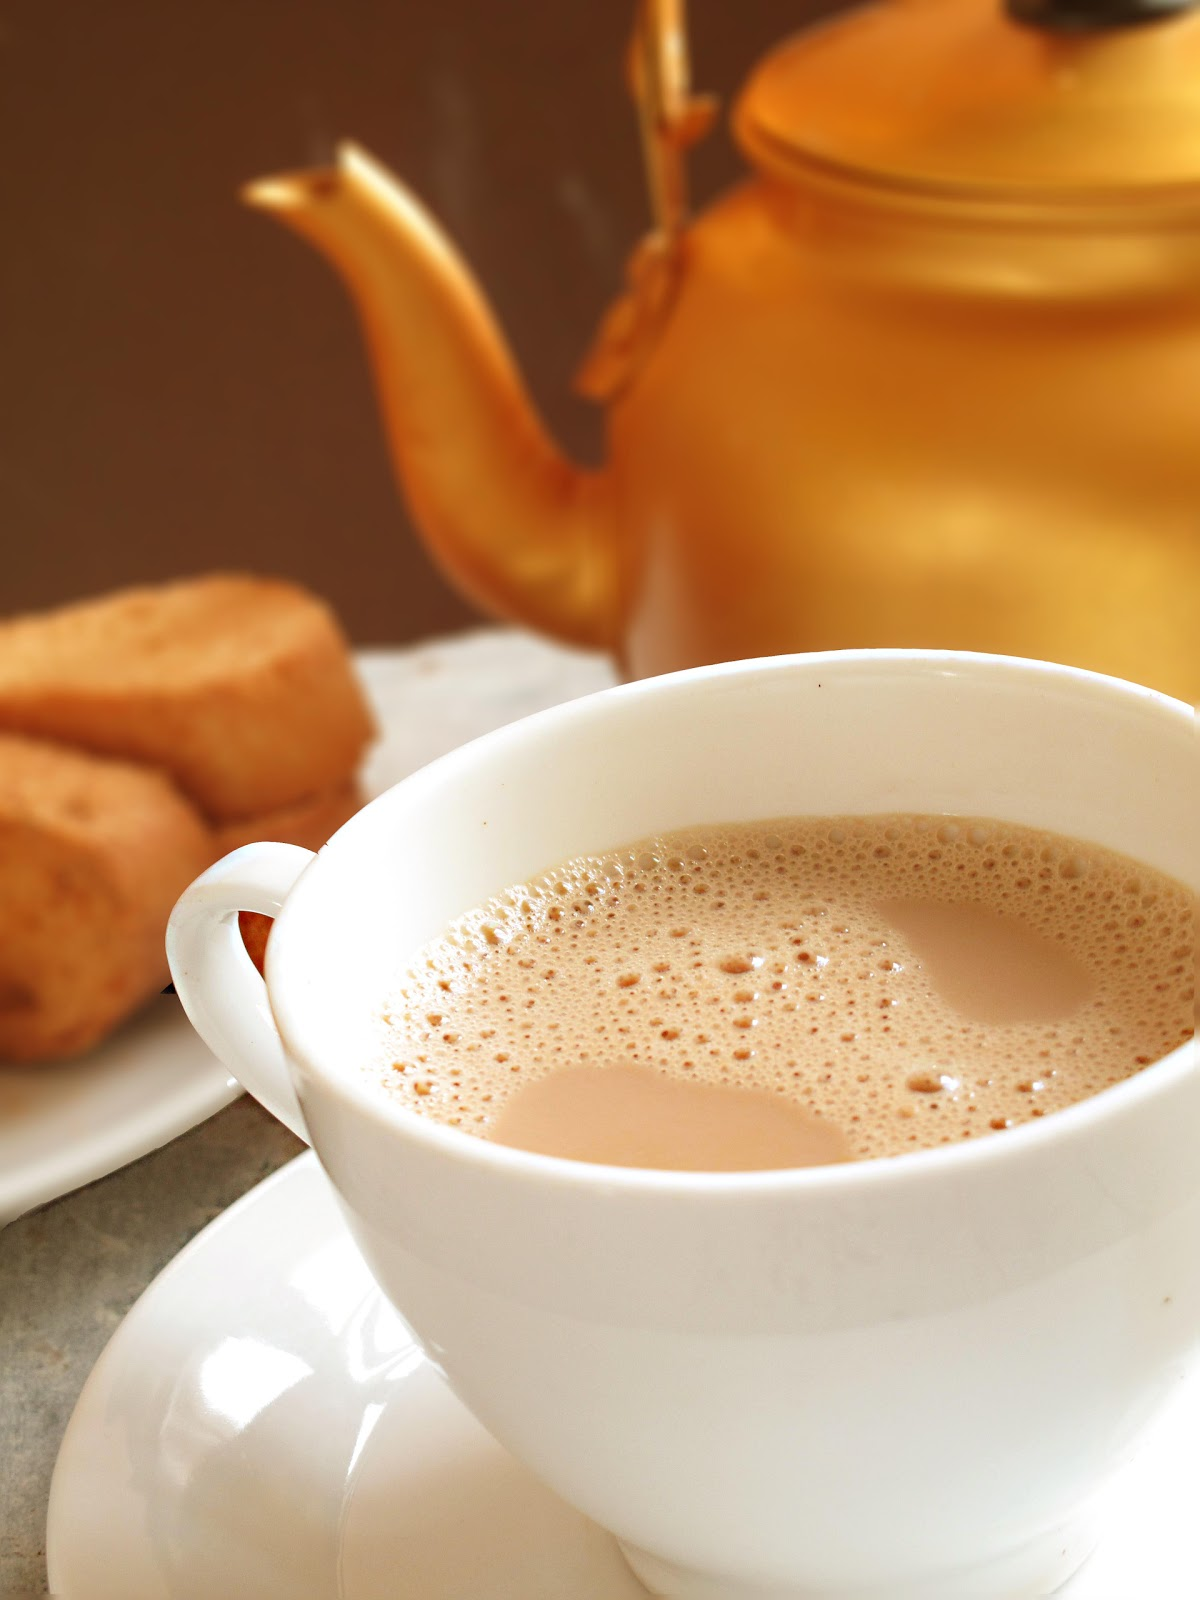 Journey Kitchen: Masala Chai - Indian Spiced Milk Tea